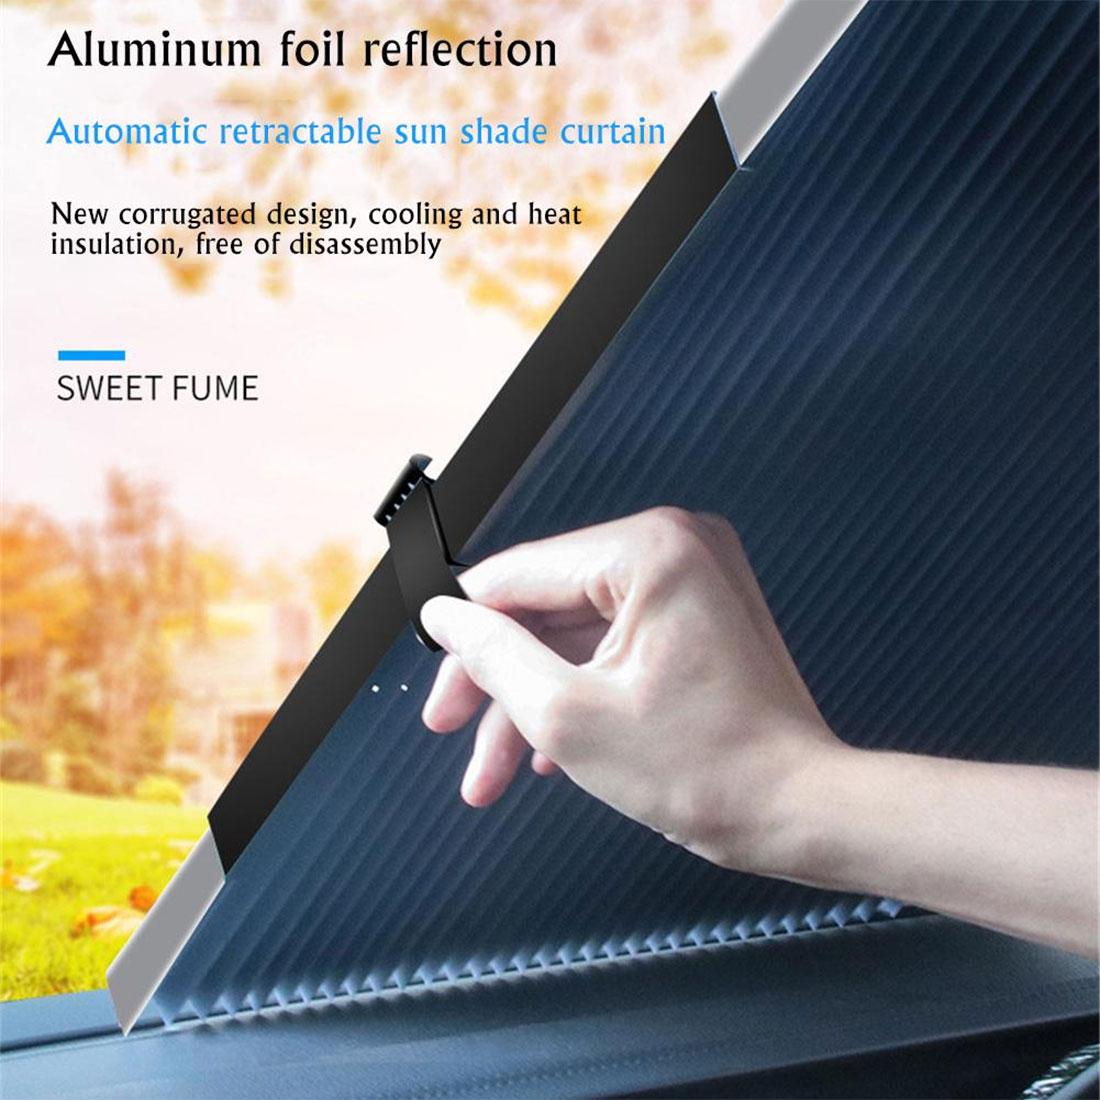 Parasol de coche, Protector de visera retráctil, plegable, cortina de visera frontal para parabrisas, cortinas protectoras UV frontal y trasera